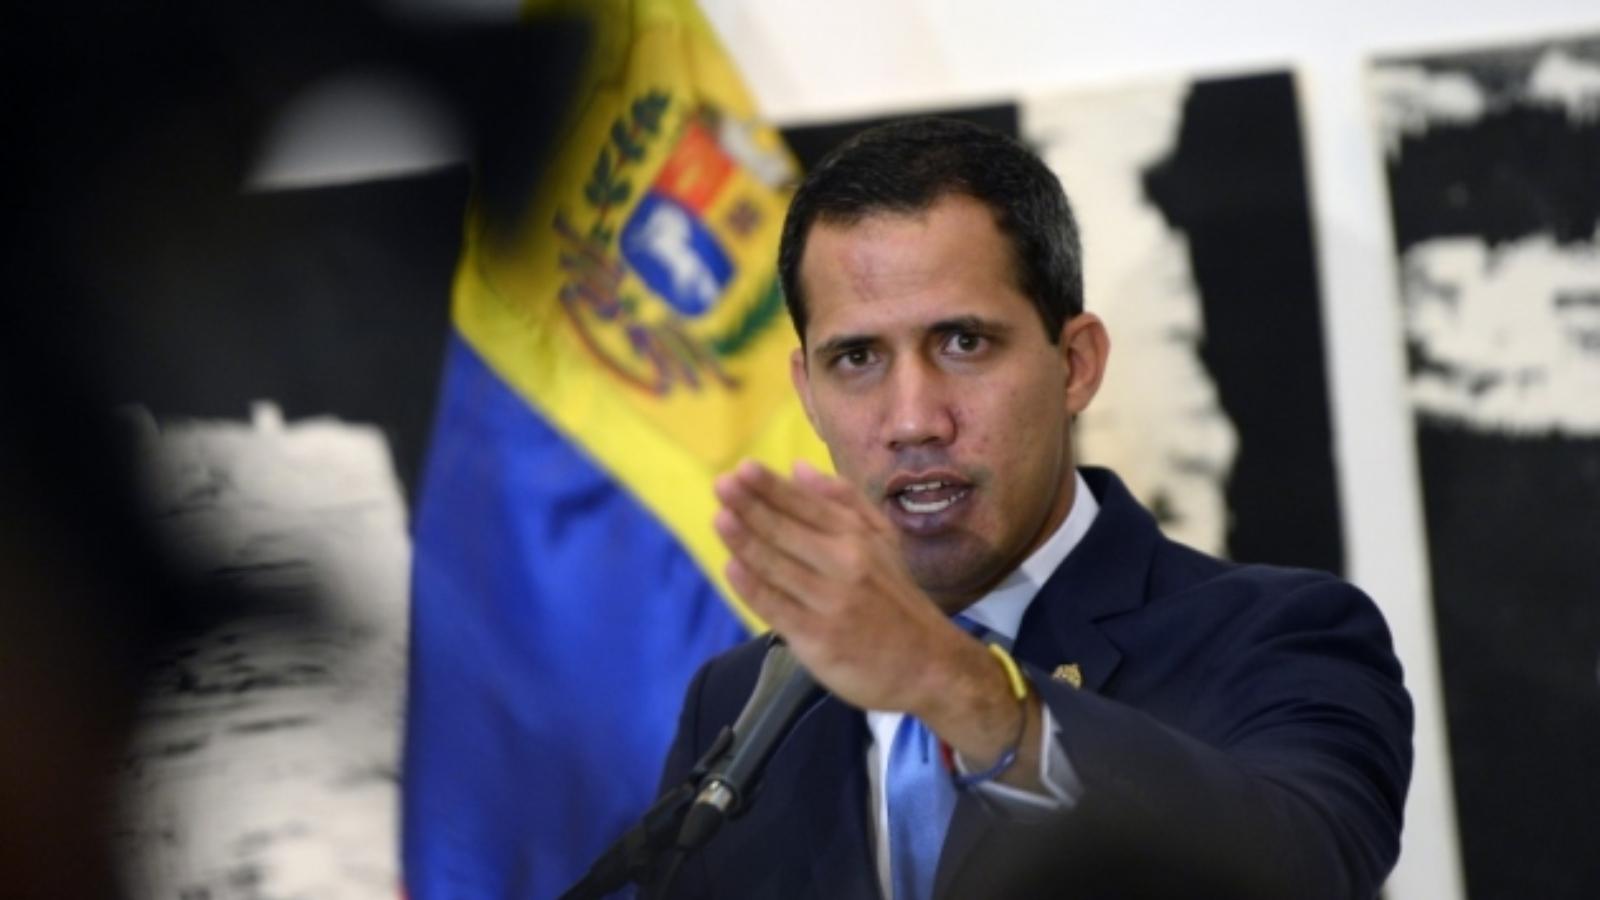 Juan Guaidó pone a prueba su poder de convocatoria